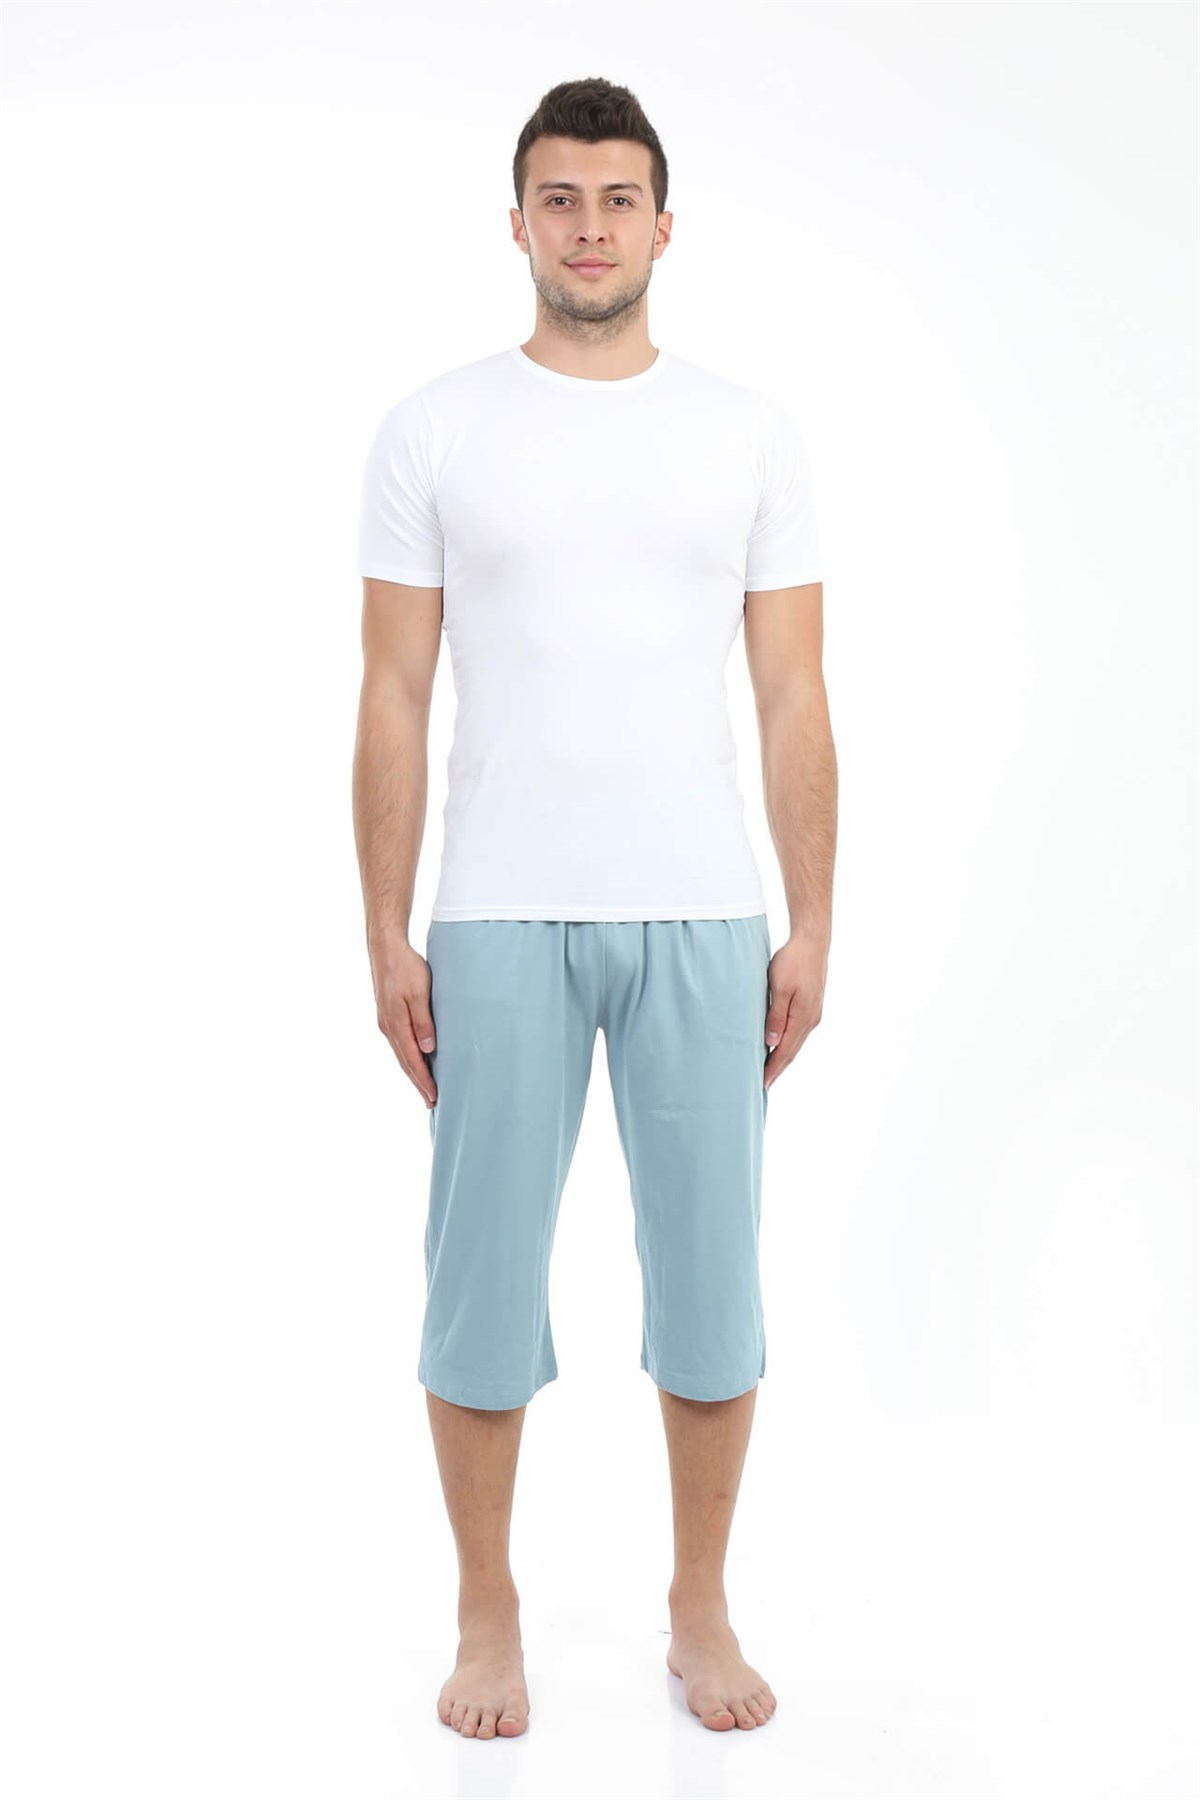 Moda Çizgi Erkek Pamuk Kapri 27194